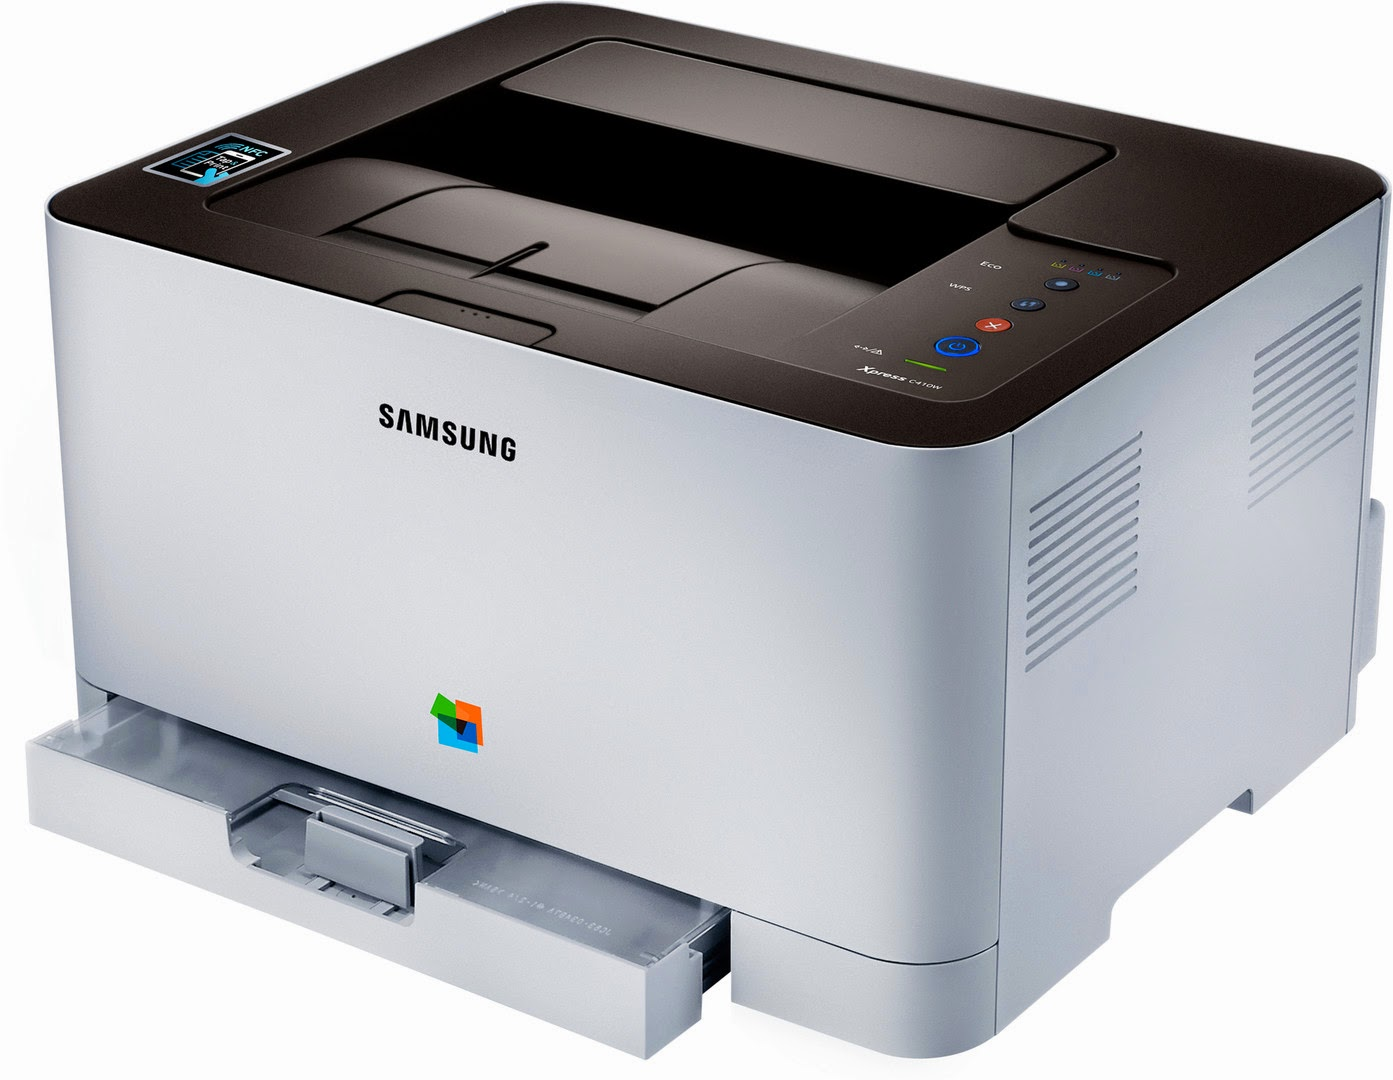 Samsung C410W Driver Download